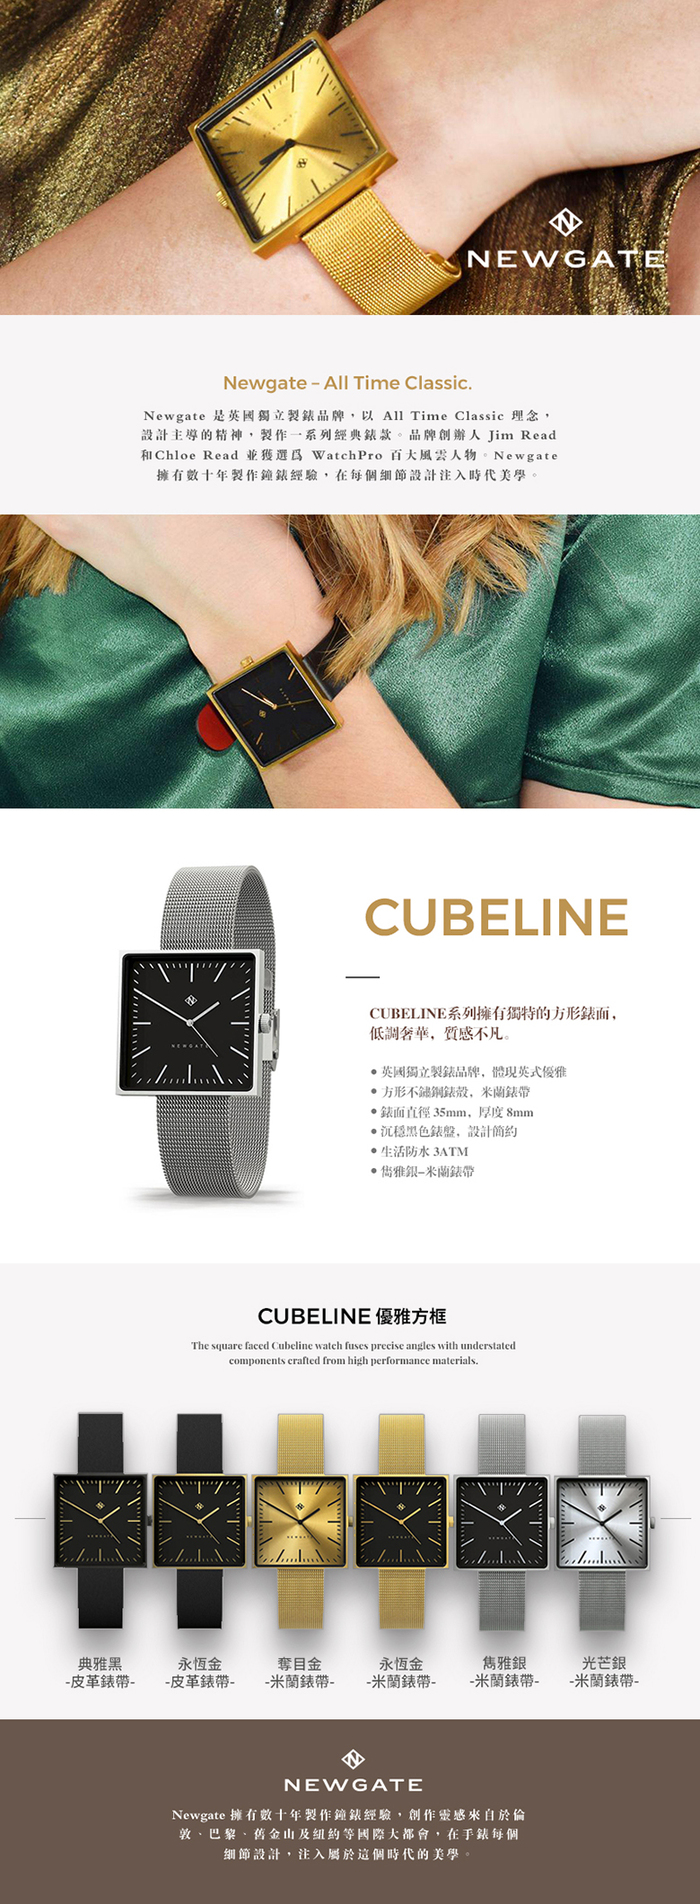 Newgate | CUBELINE-雋雅銀-不鏽鋼米蘭帶-35mm